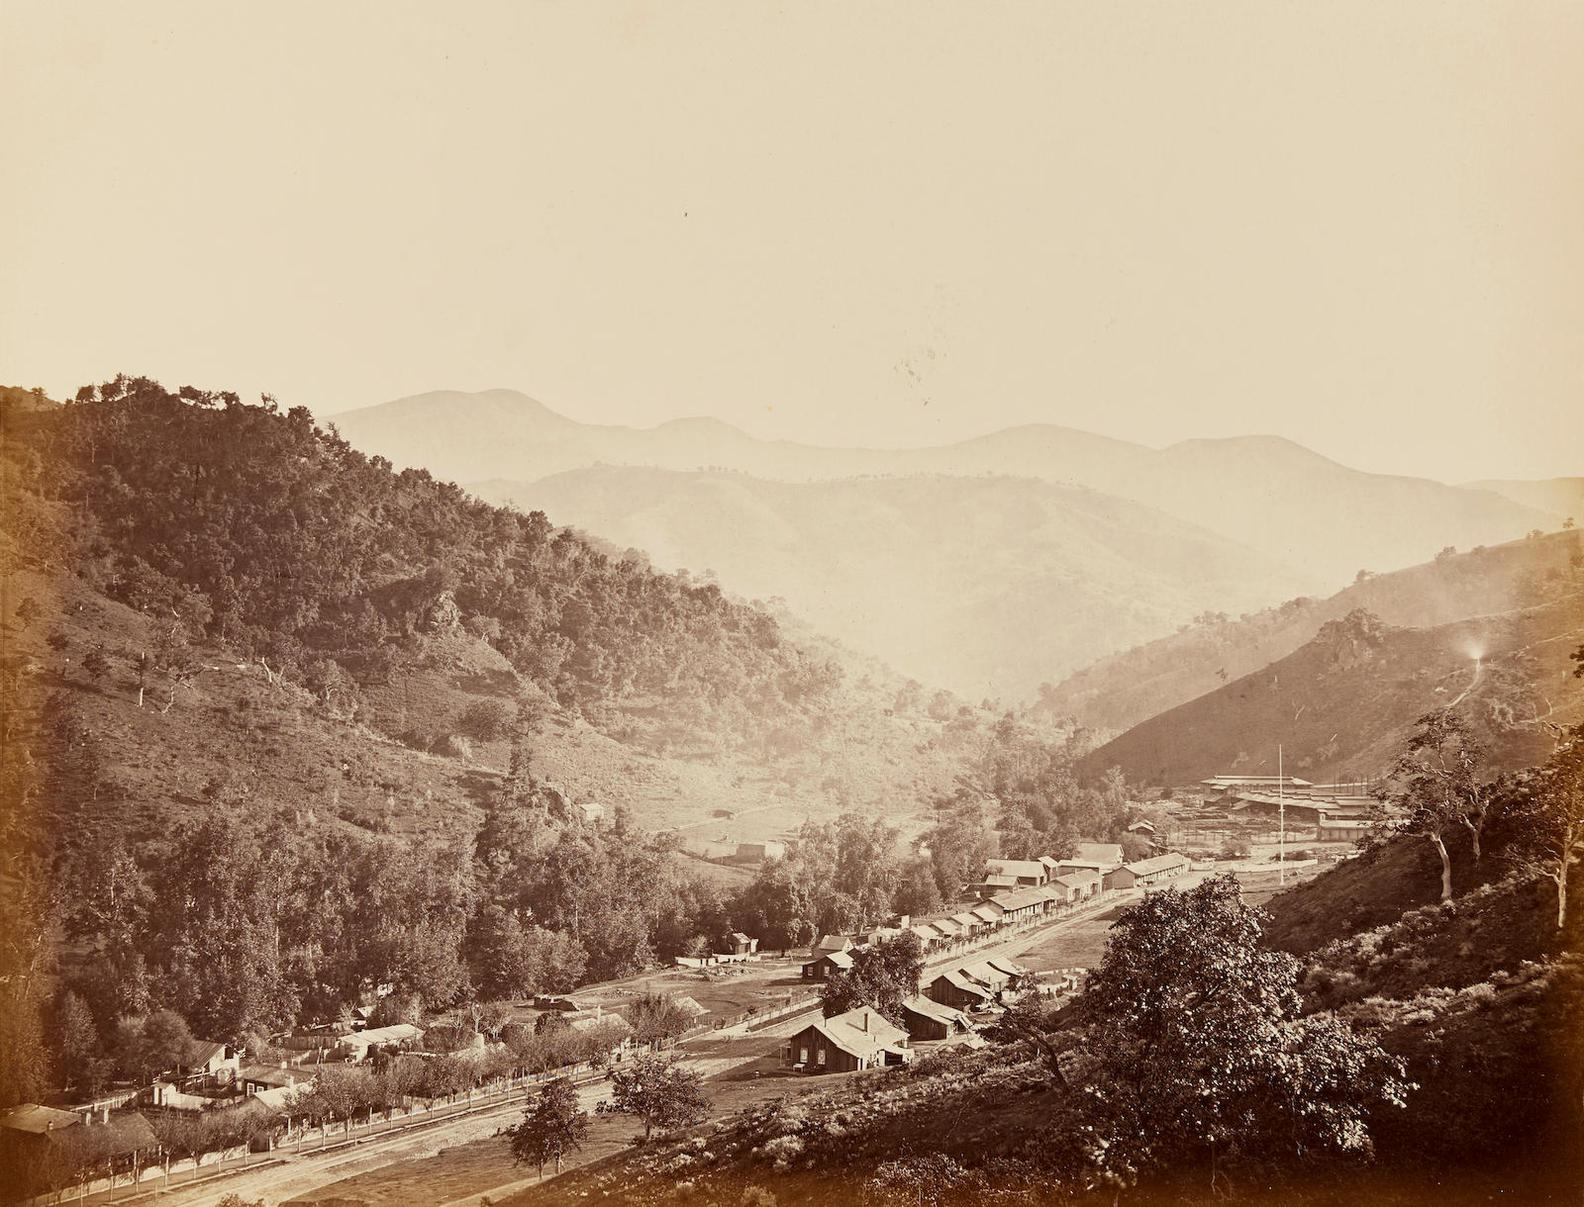 Carleton E. Watkins-Street View, Acienda, New Almaden, Santa Clara County, California-1863